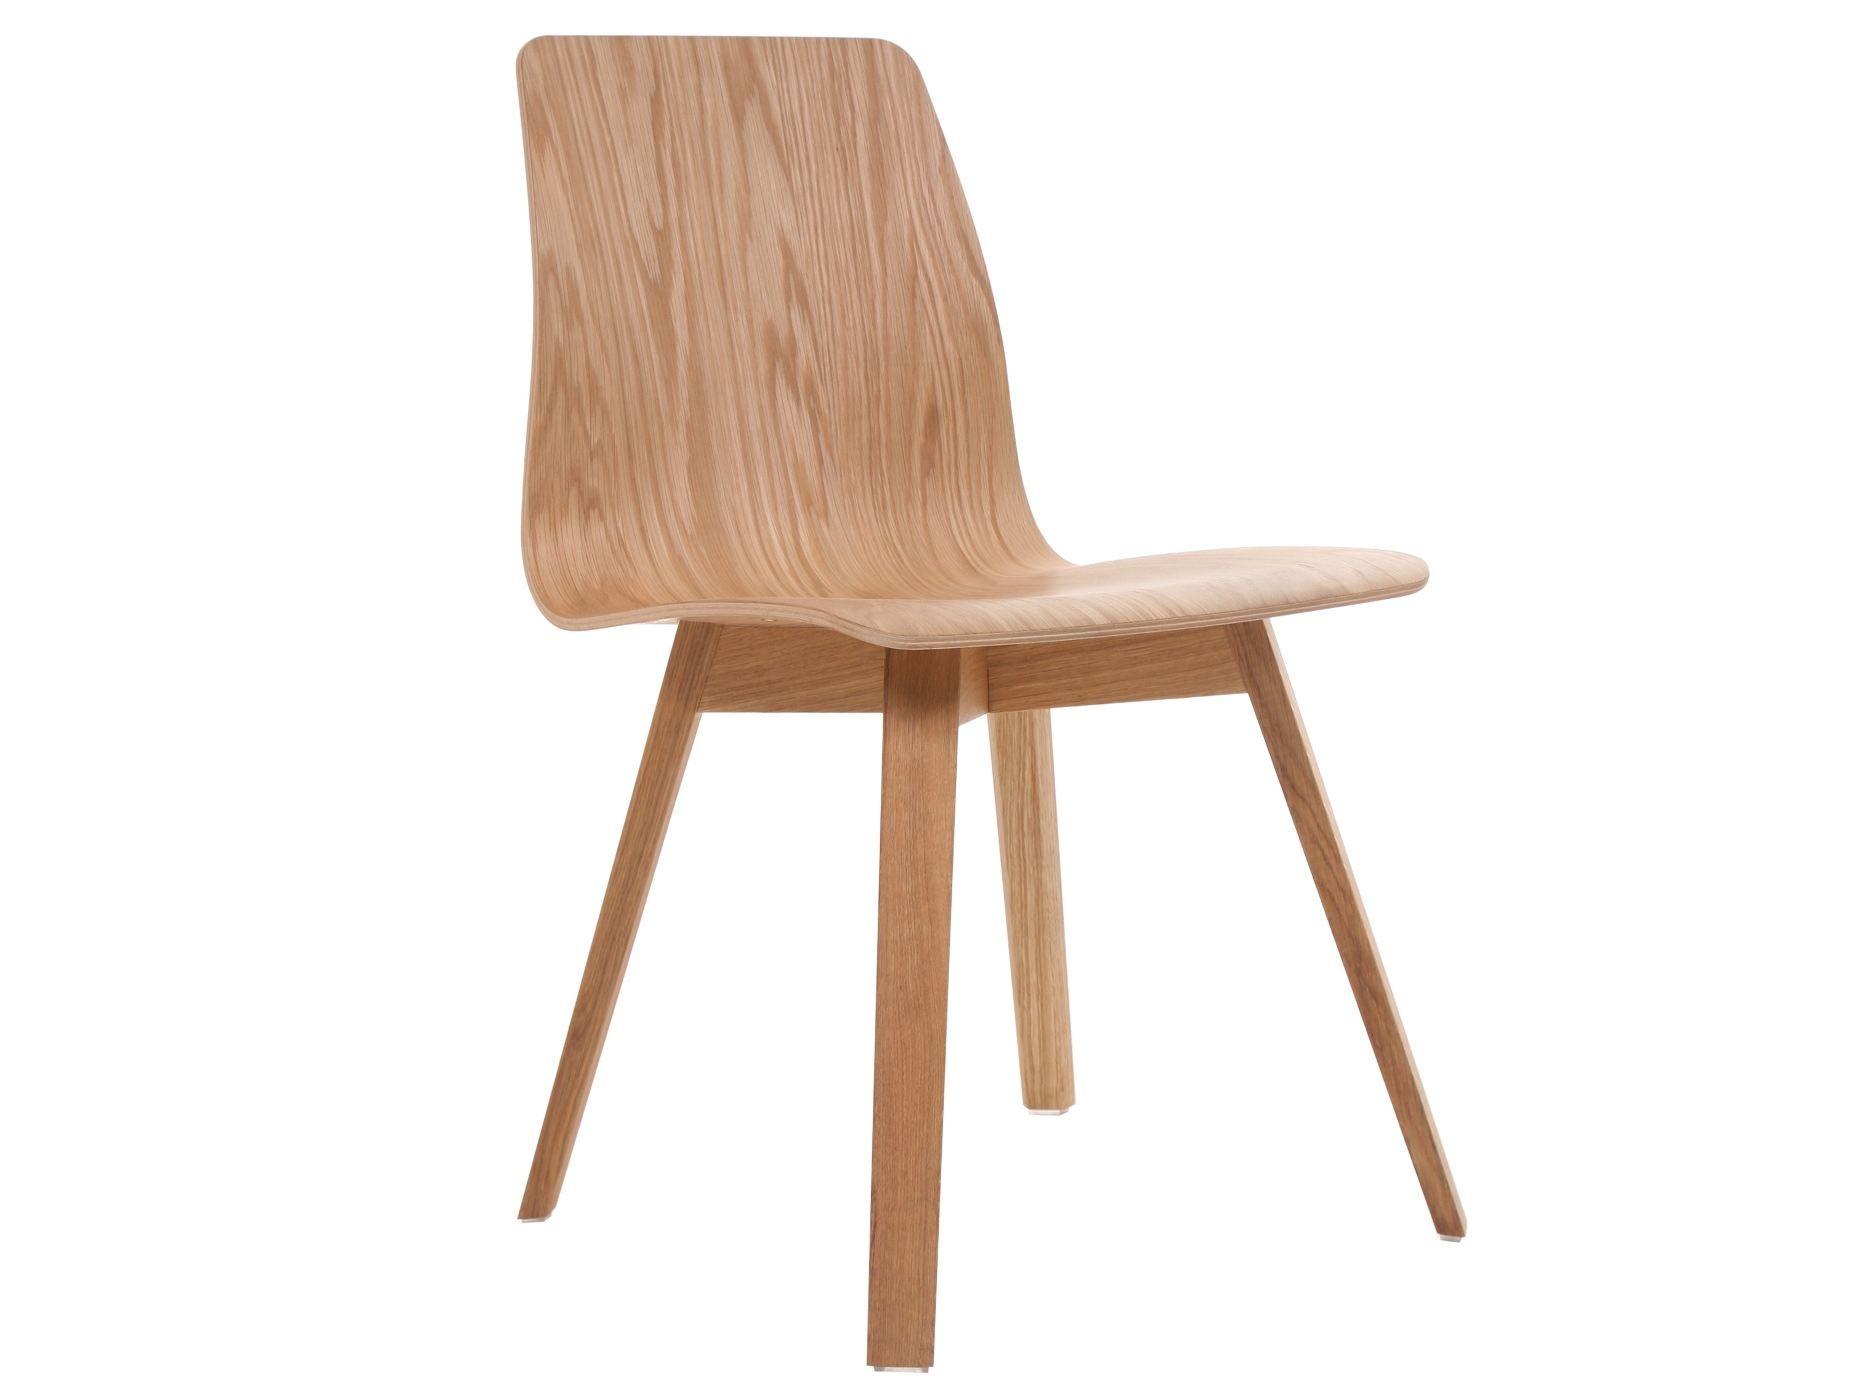 maverick sedia in legno by kff design birgit hoffmann. Black Bedroom Furniture Sets. Home Design Ideas